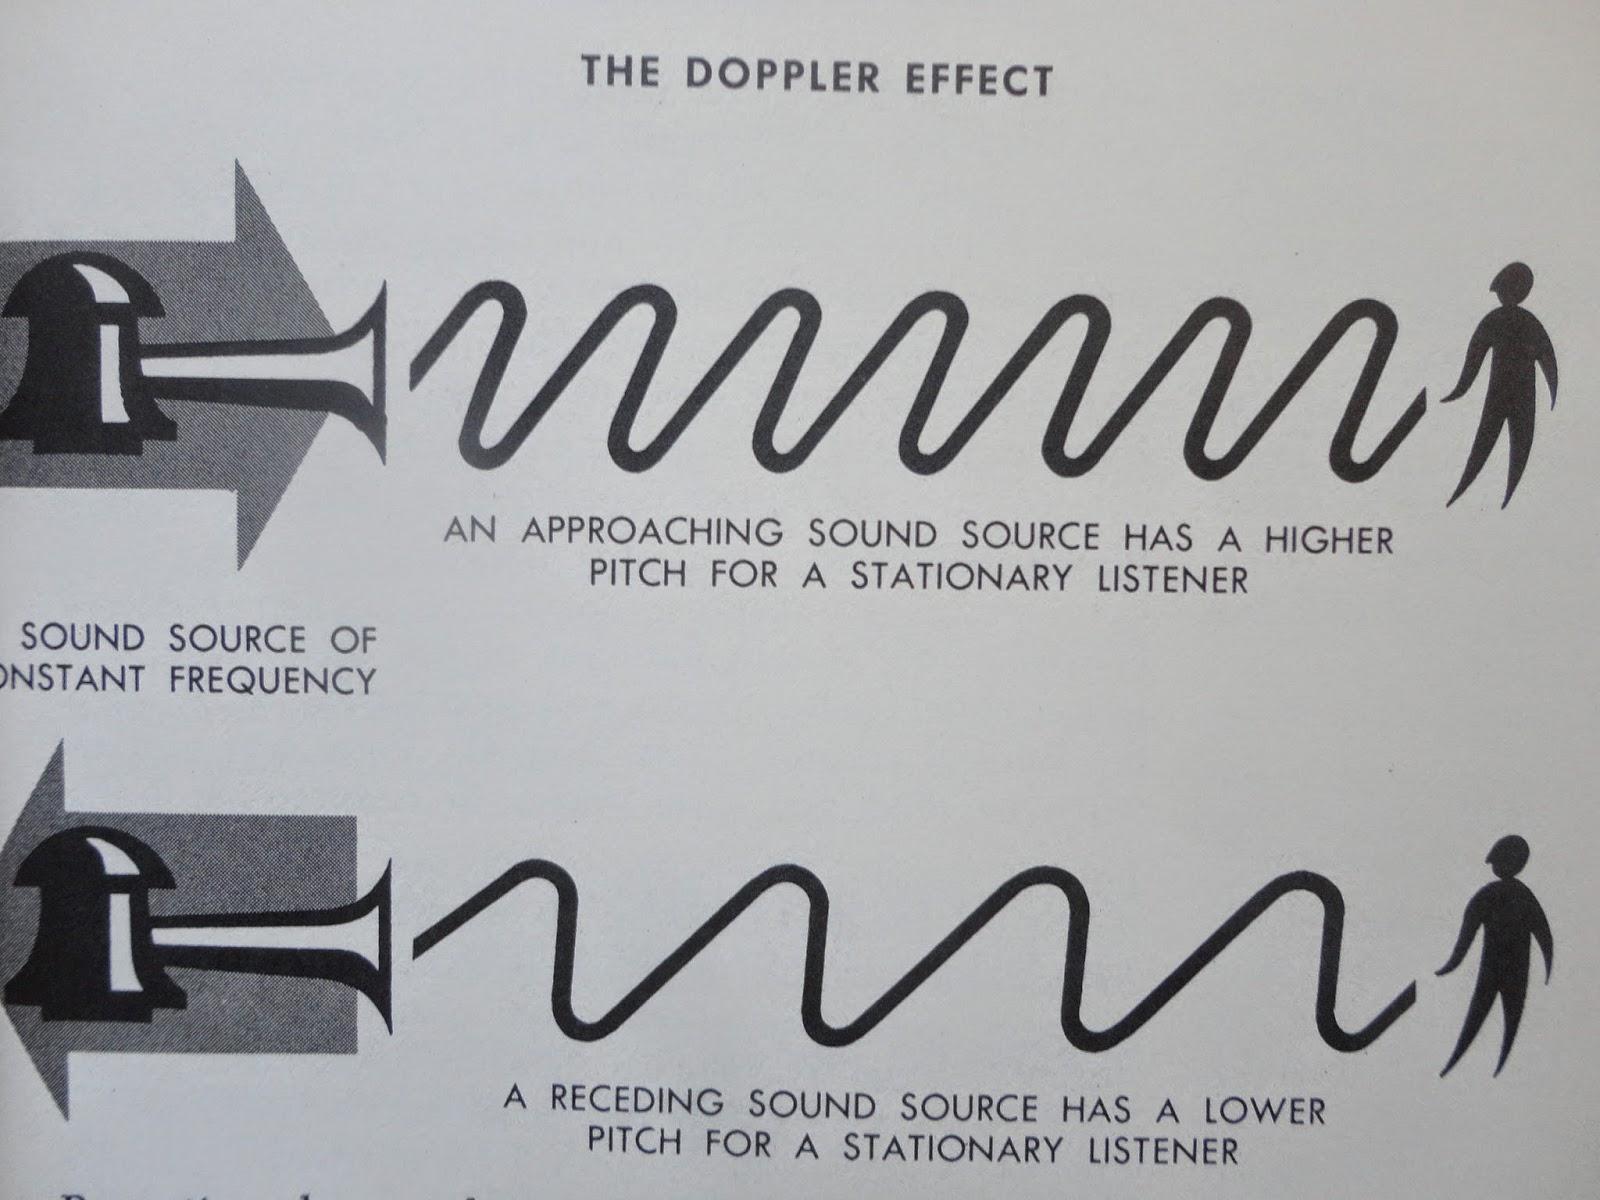 Doppler effect research paper